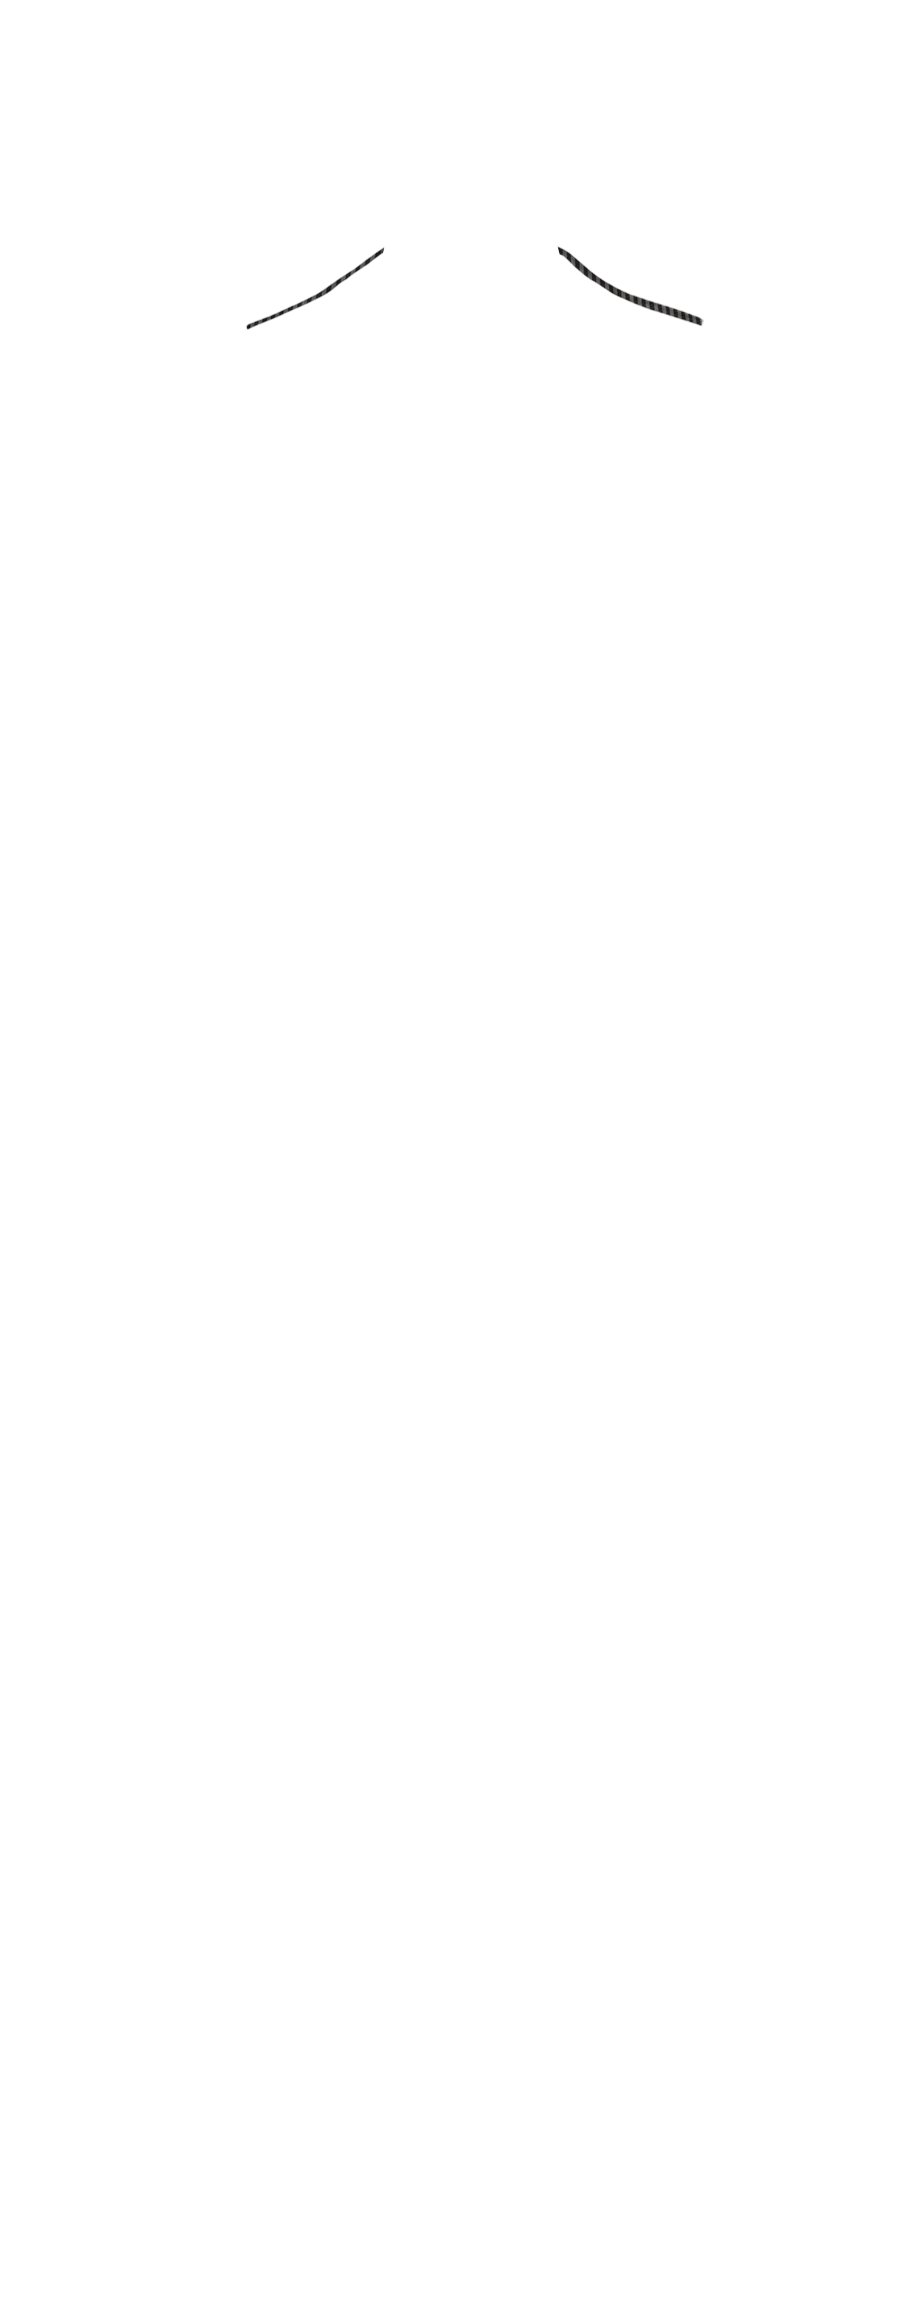 NEFL-5